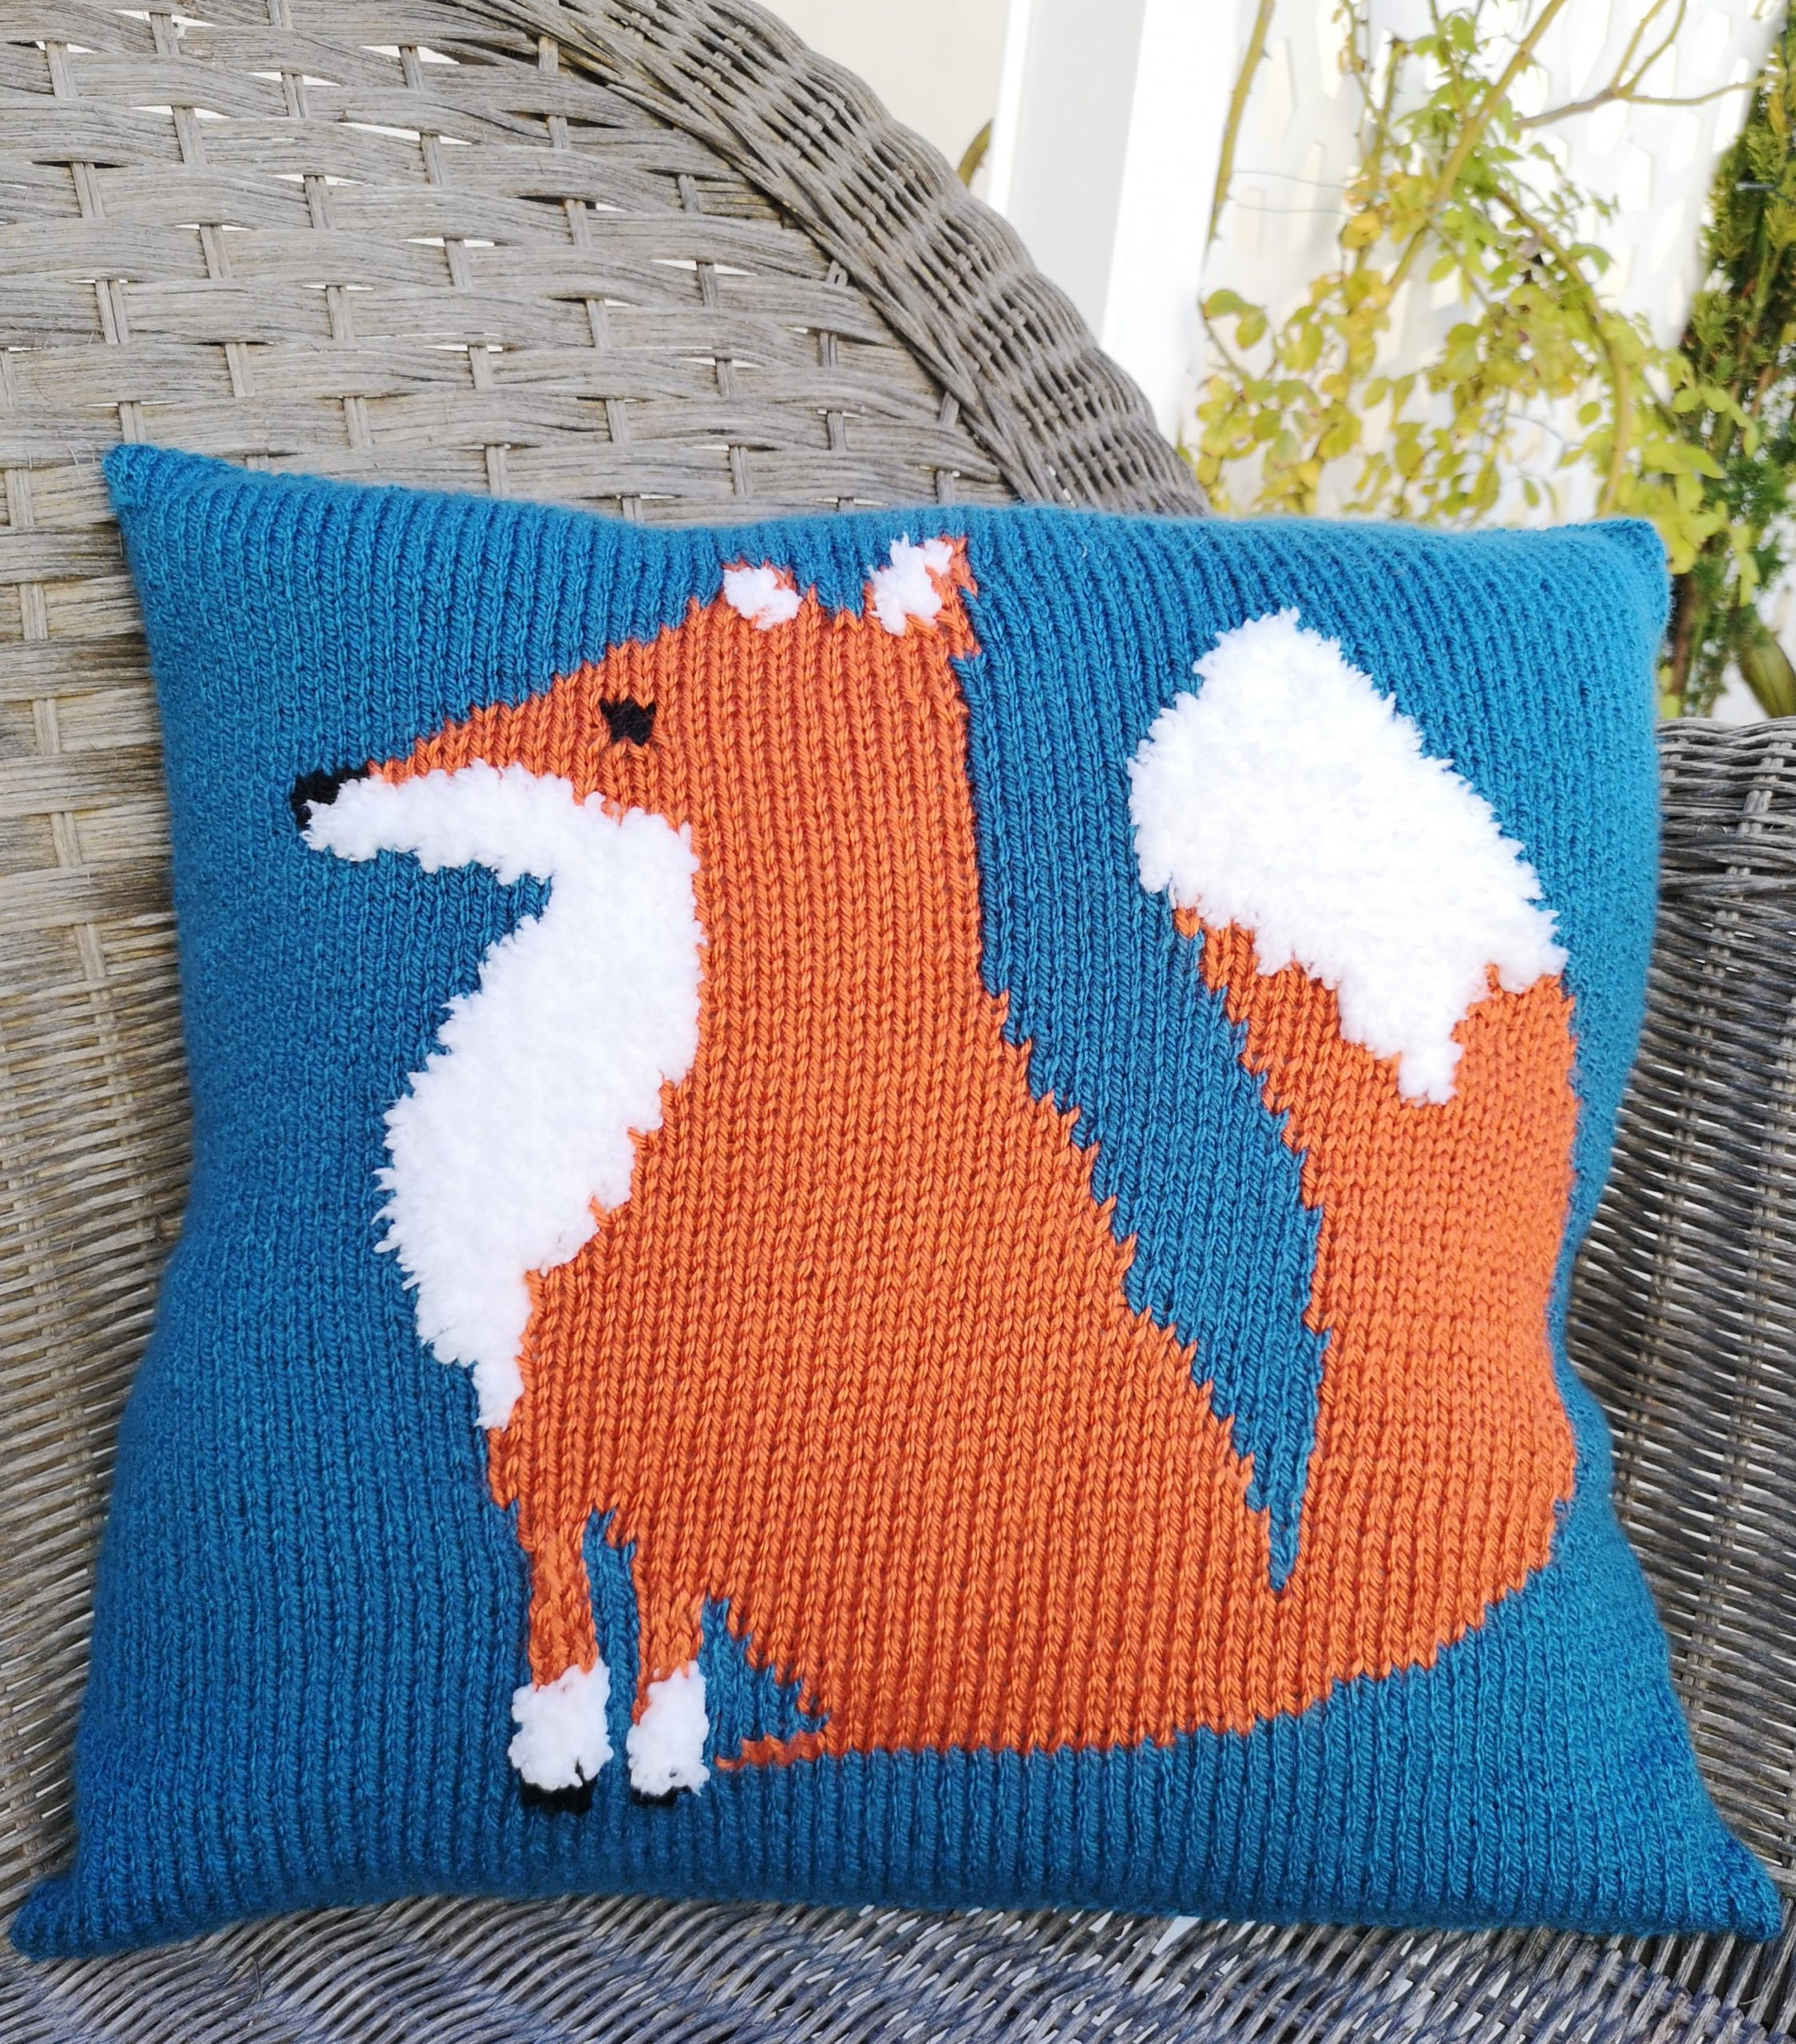 Knitting Pattern for an Aran Mr Fox Cushion, Knitting ...